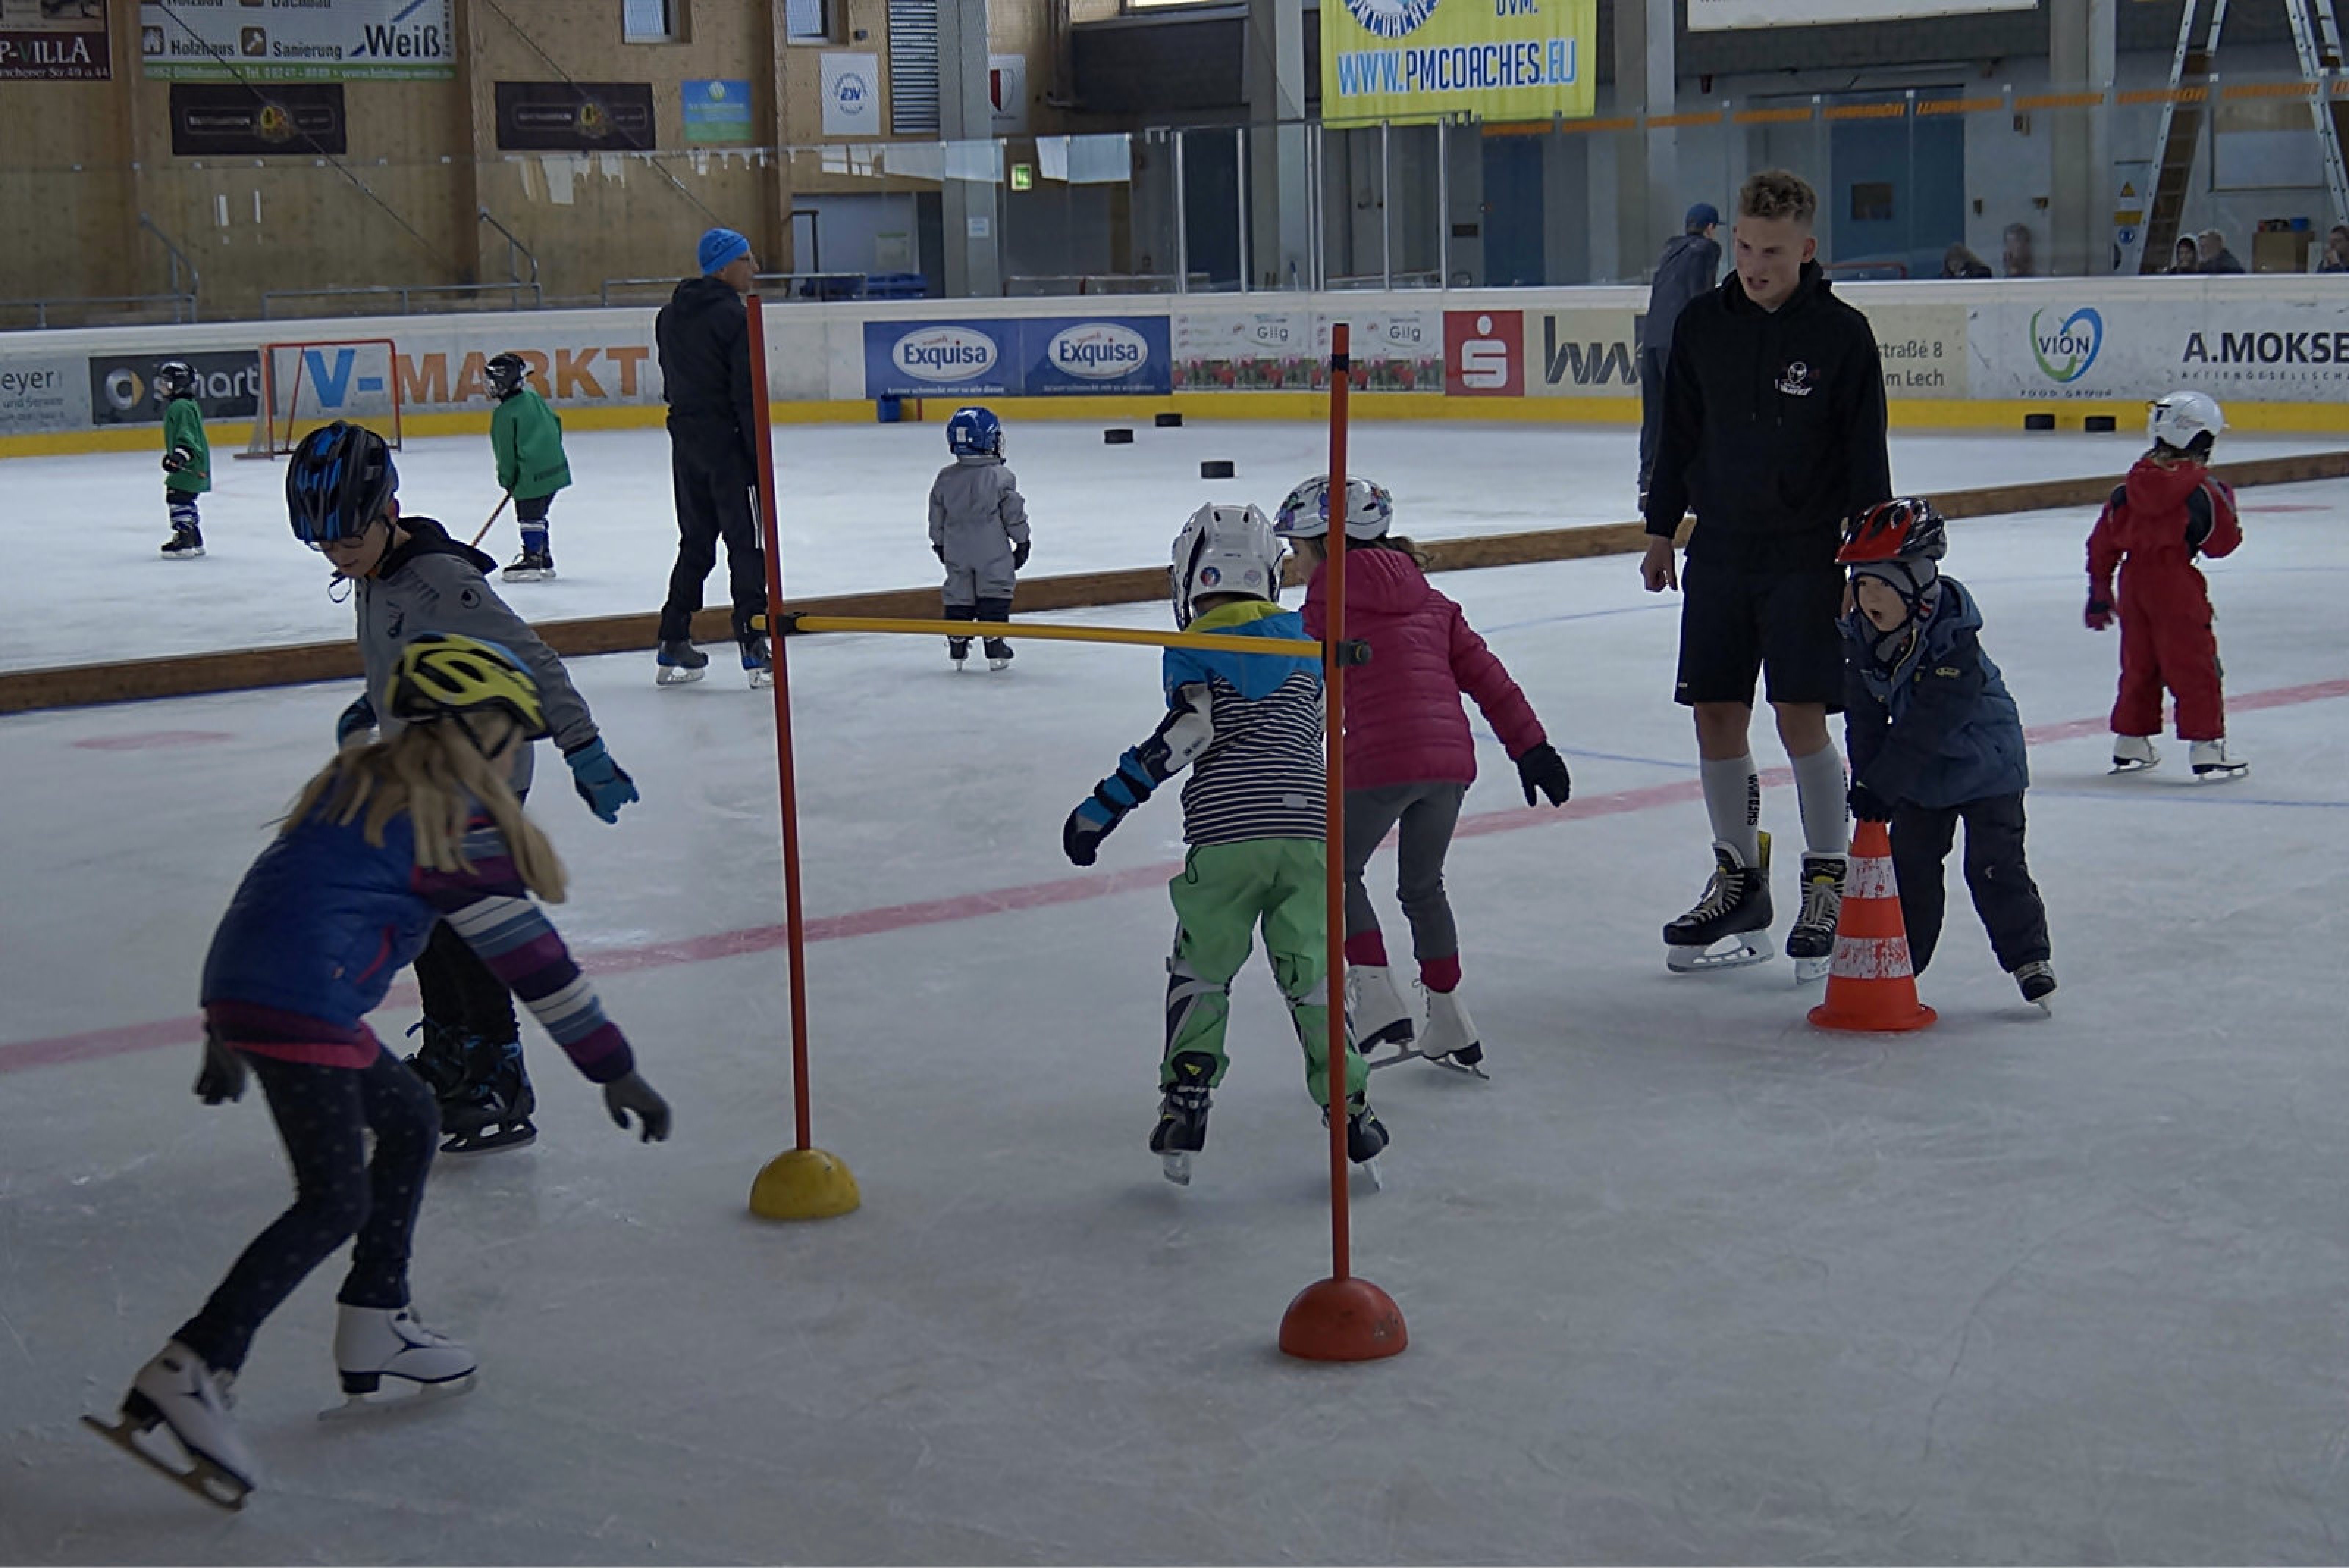 Kids on Ice Day 15.09 (1)